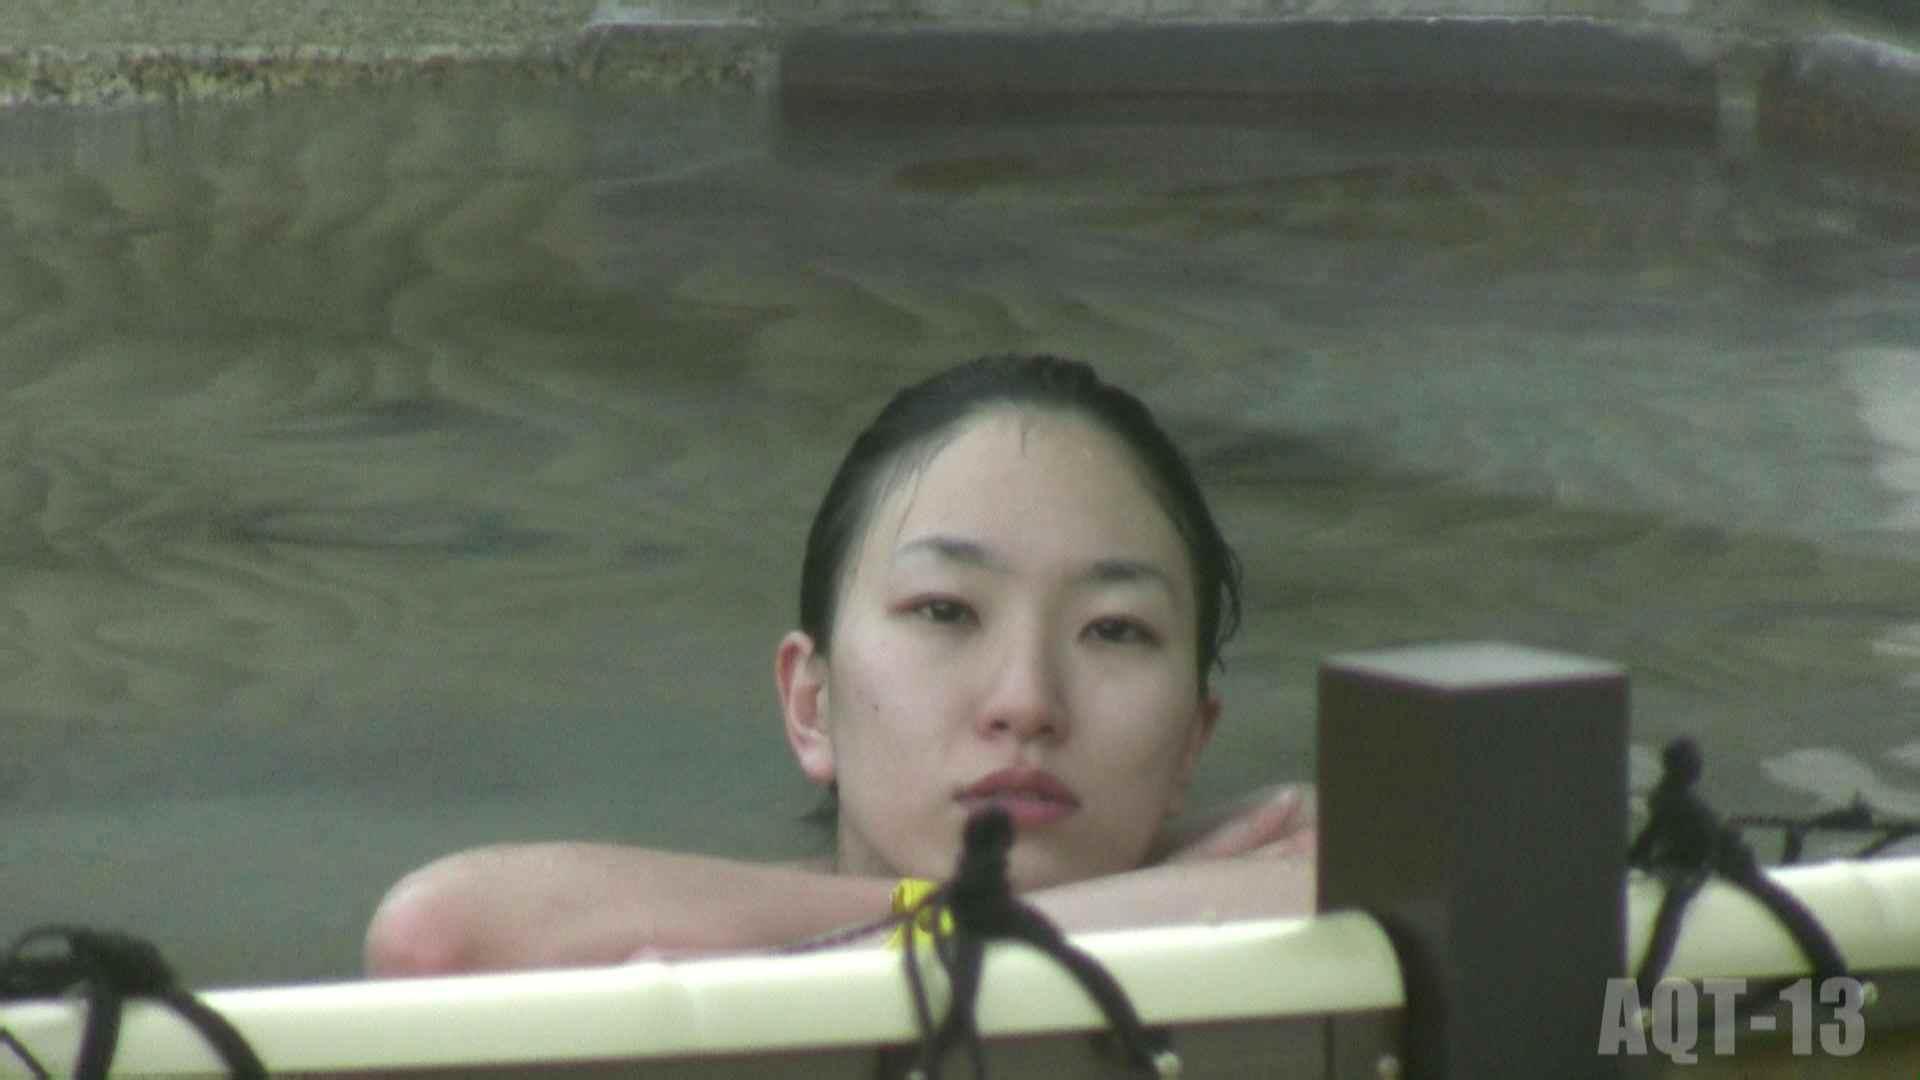 Aquaな露天風呂Vol.818 いやらしいOL おめこ無修正動画無料 72連発 20